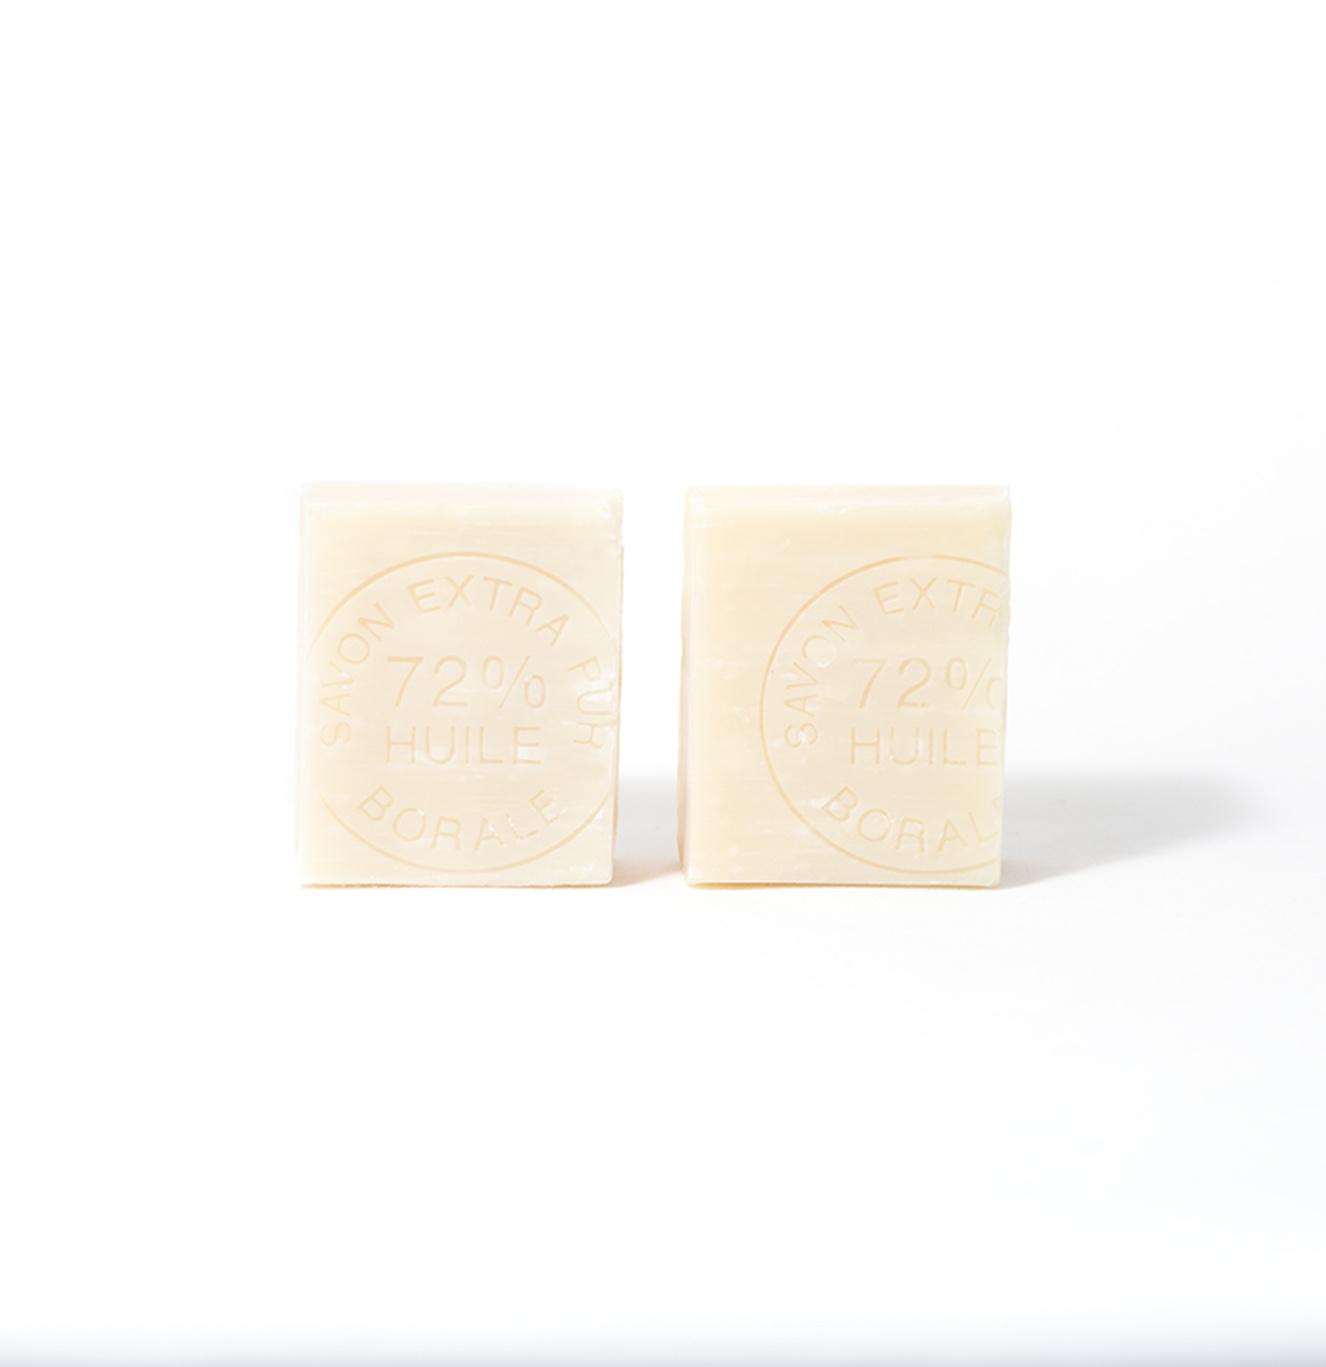 EXTRA PUR SOAP BAR #29 CLASSIQUE 155 G